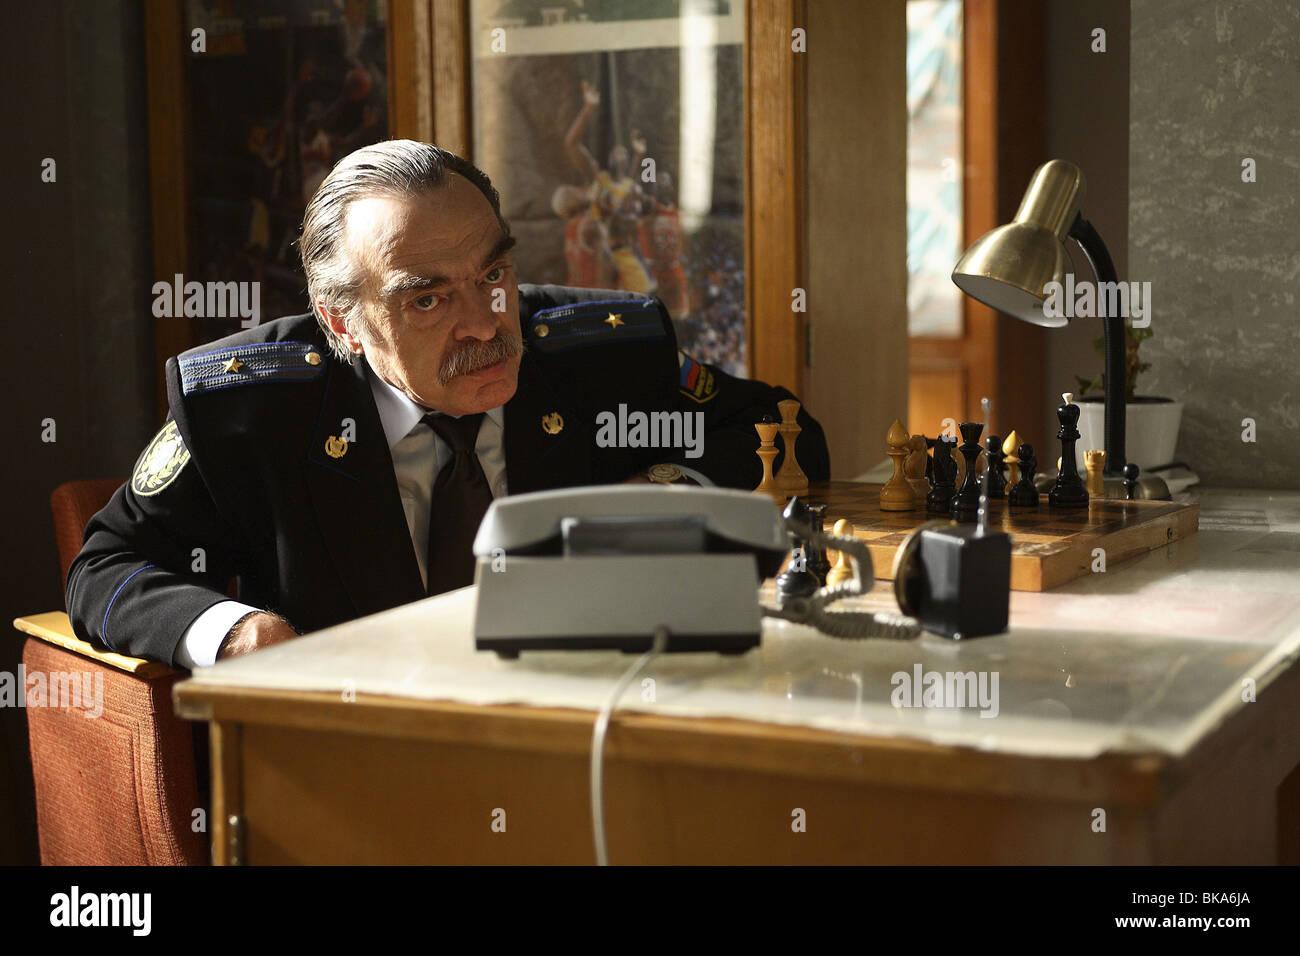 12 Year : 2007 Director : Nikita Mikhalkov Alexander Adabashian - Stock Image